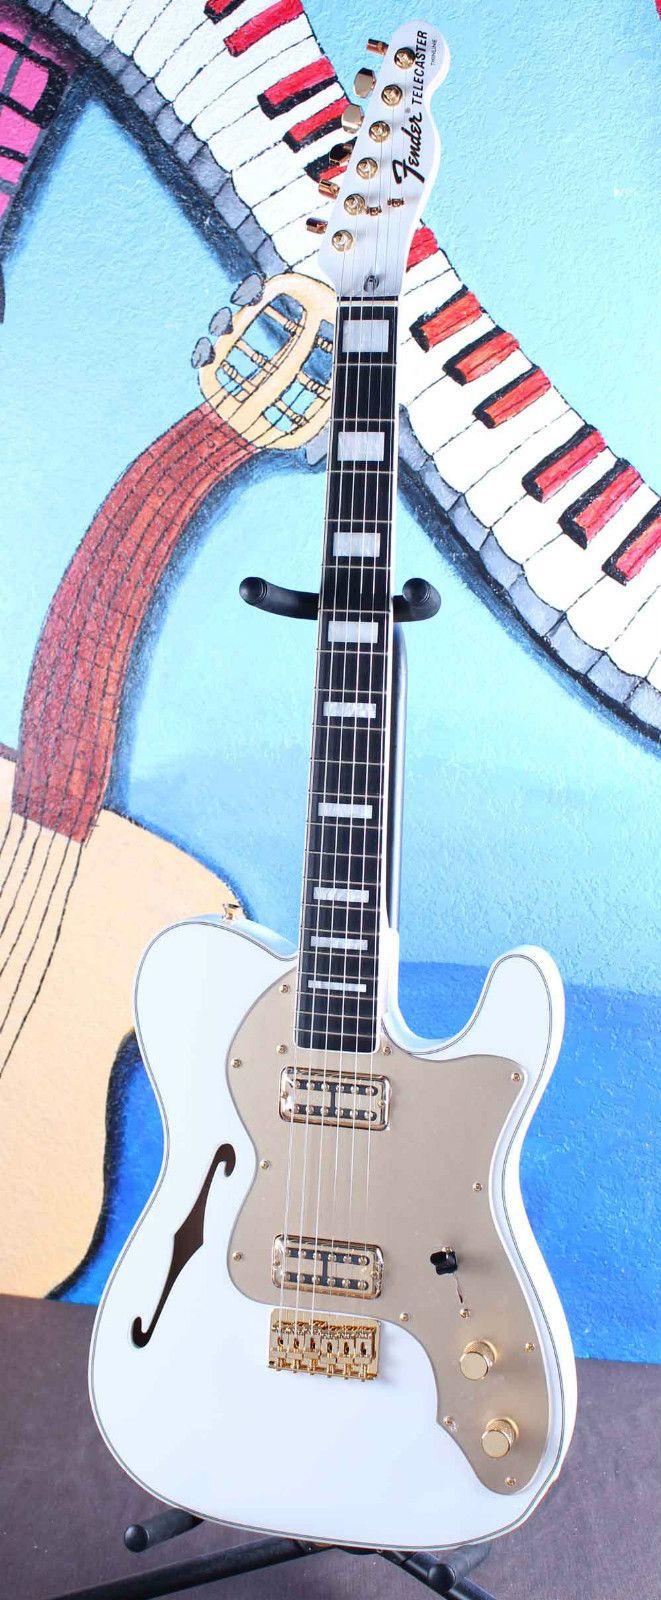 Fender FSR Telecaster Thinline Super Deluxe Olympic White Tele Electric Guitar